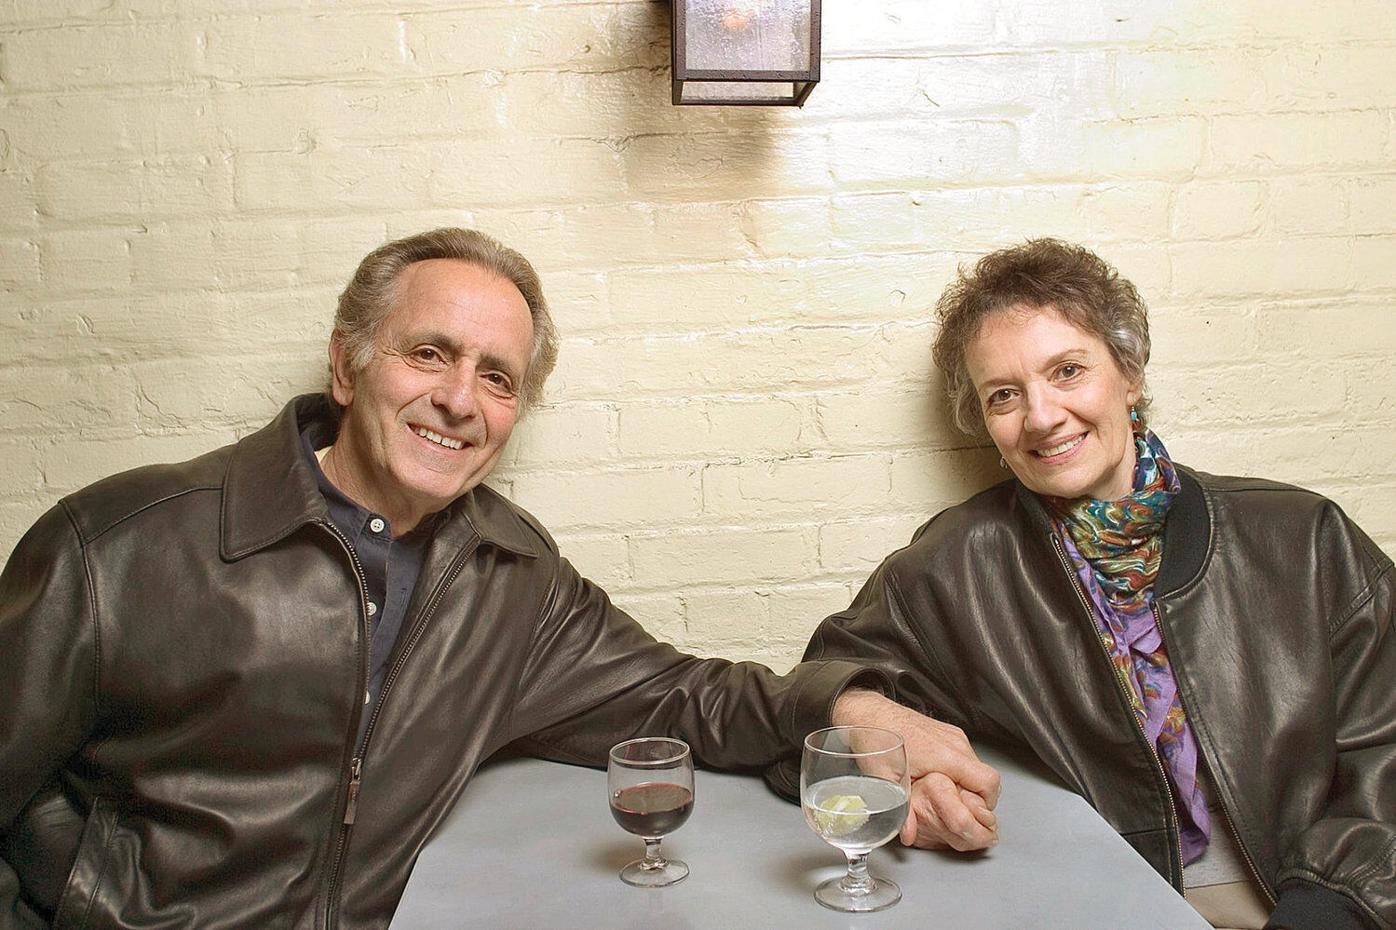 'Children of a Lesser God' playwright Mark Medoff dead at 79